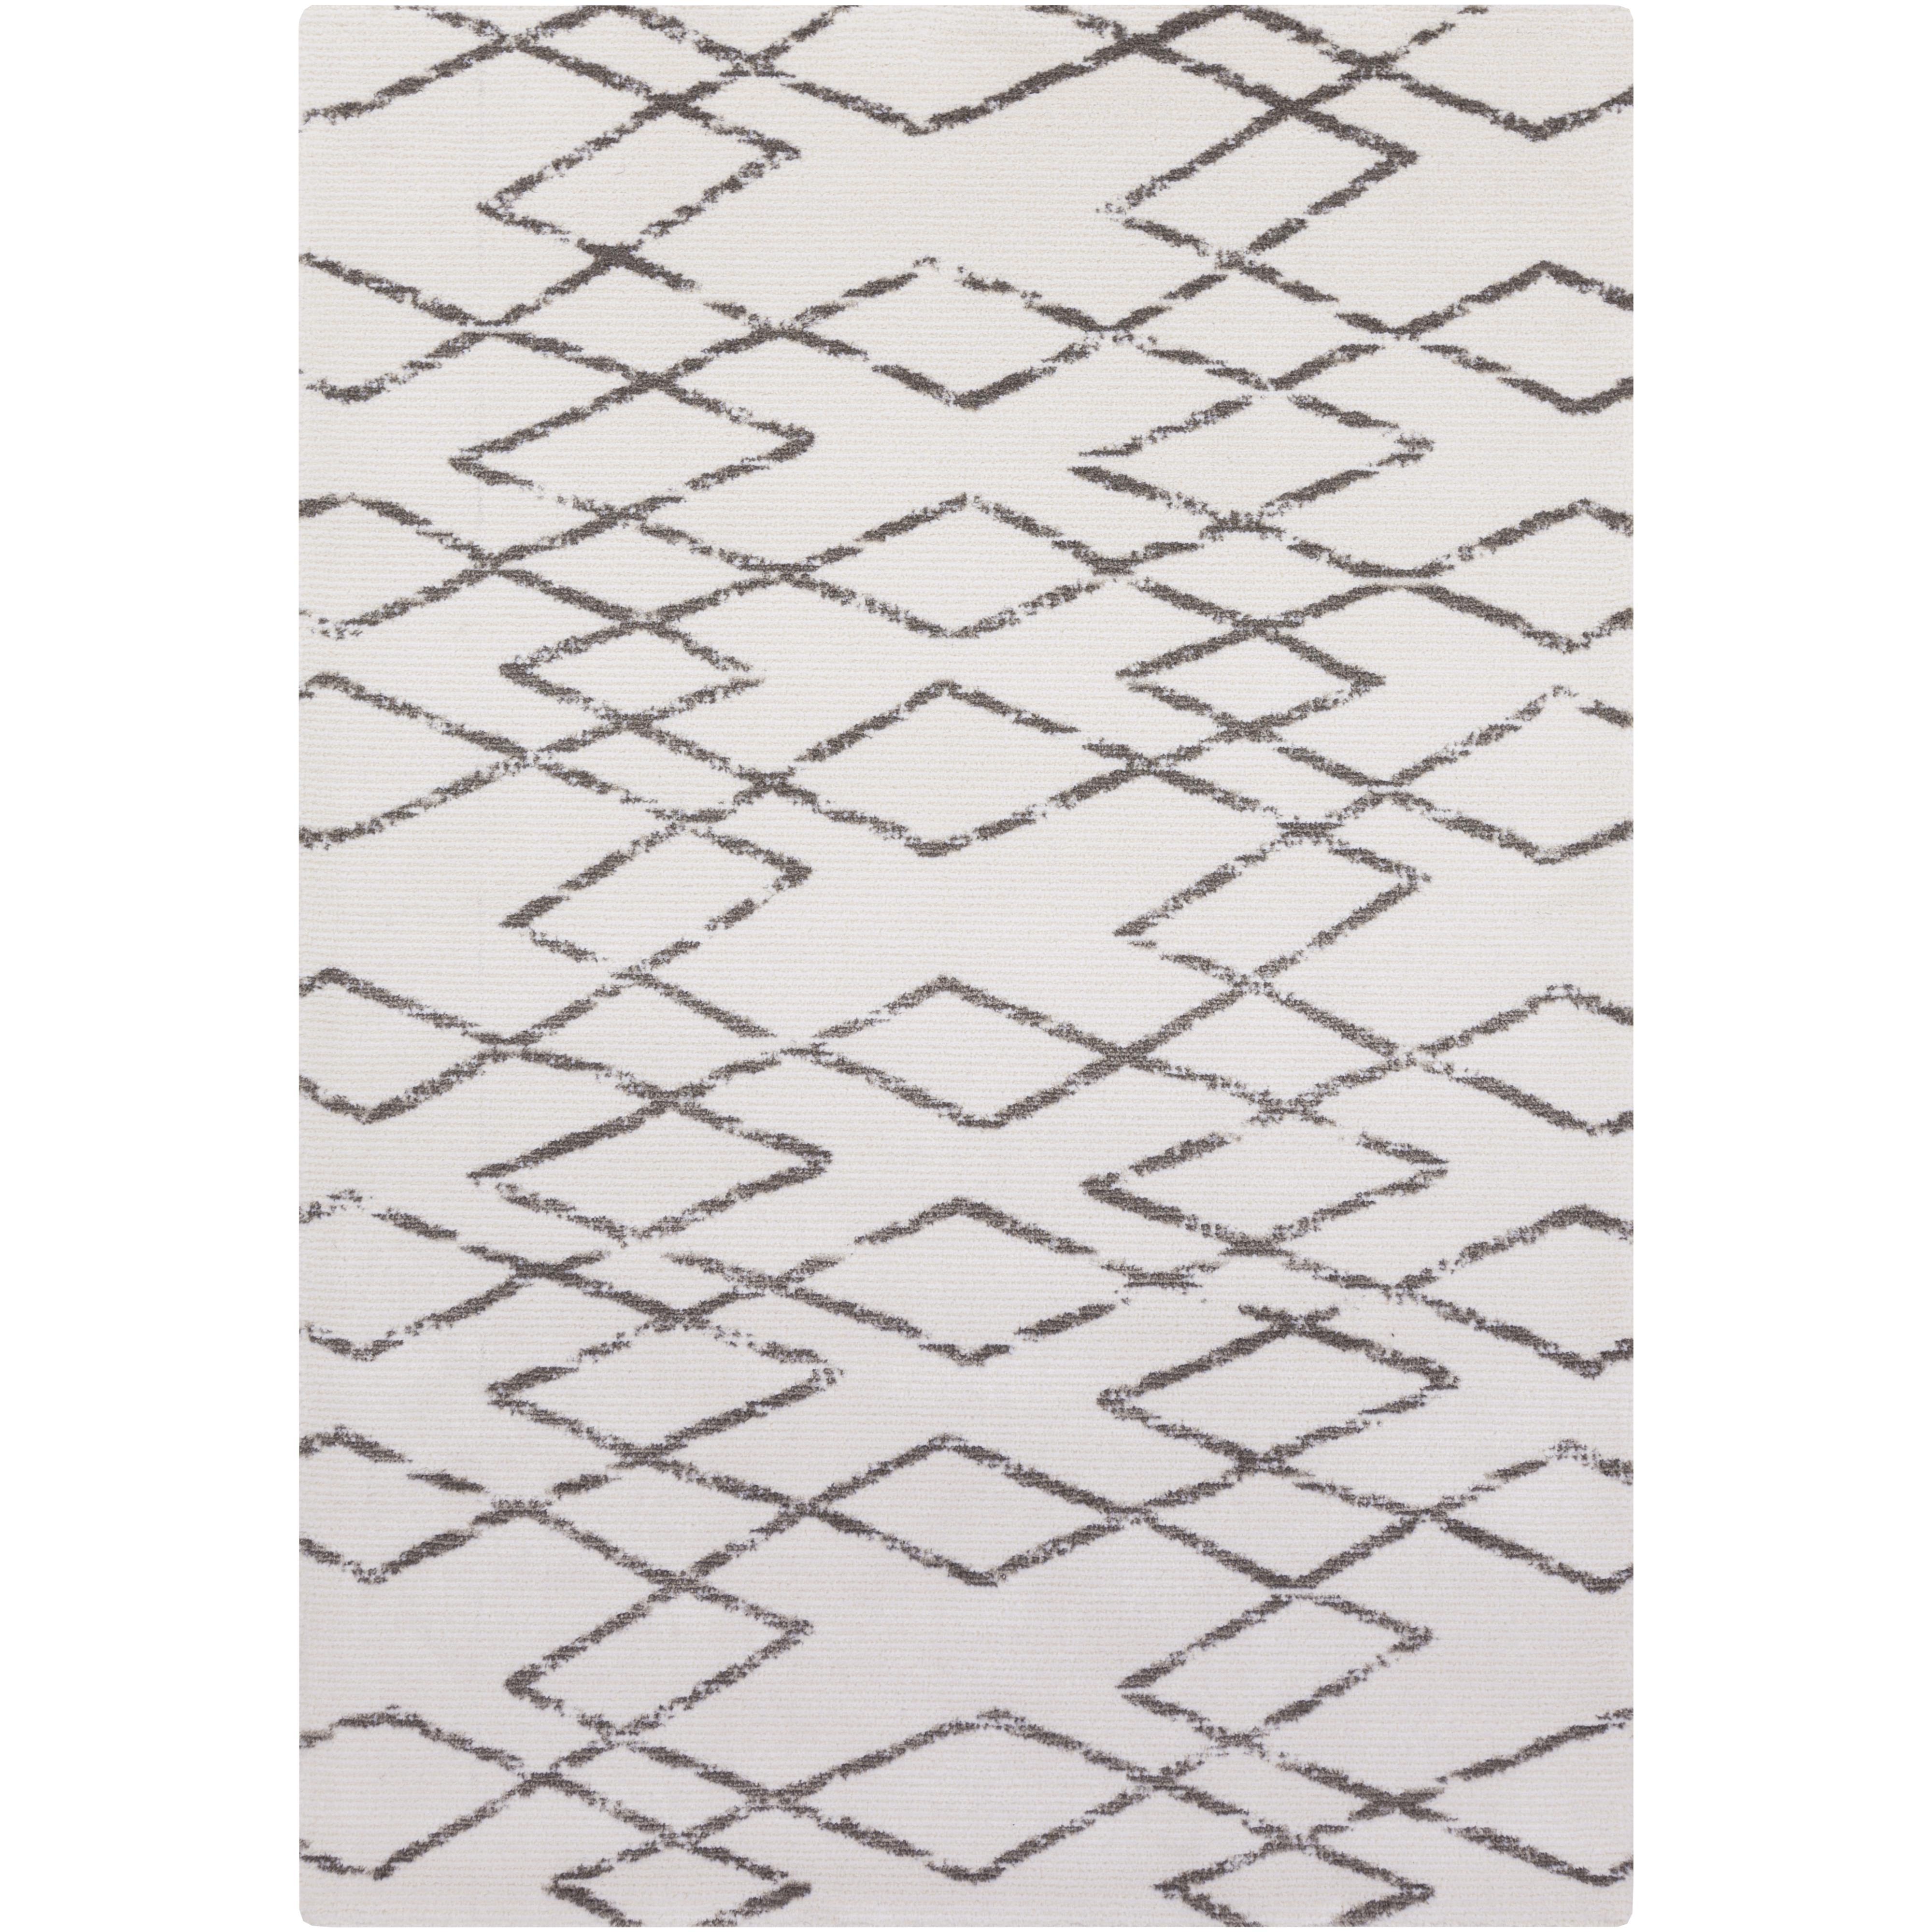 Surya Rugs Perla 8' x 10' - Item Number: PRA6001-810